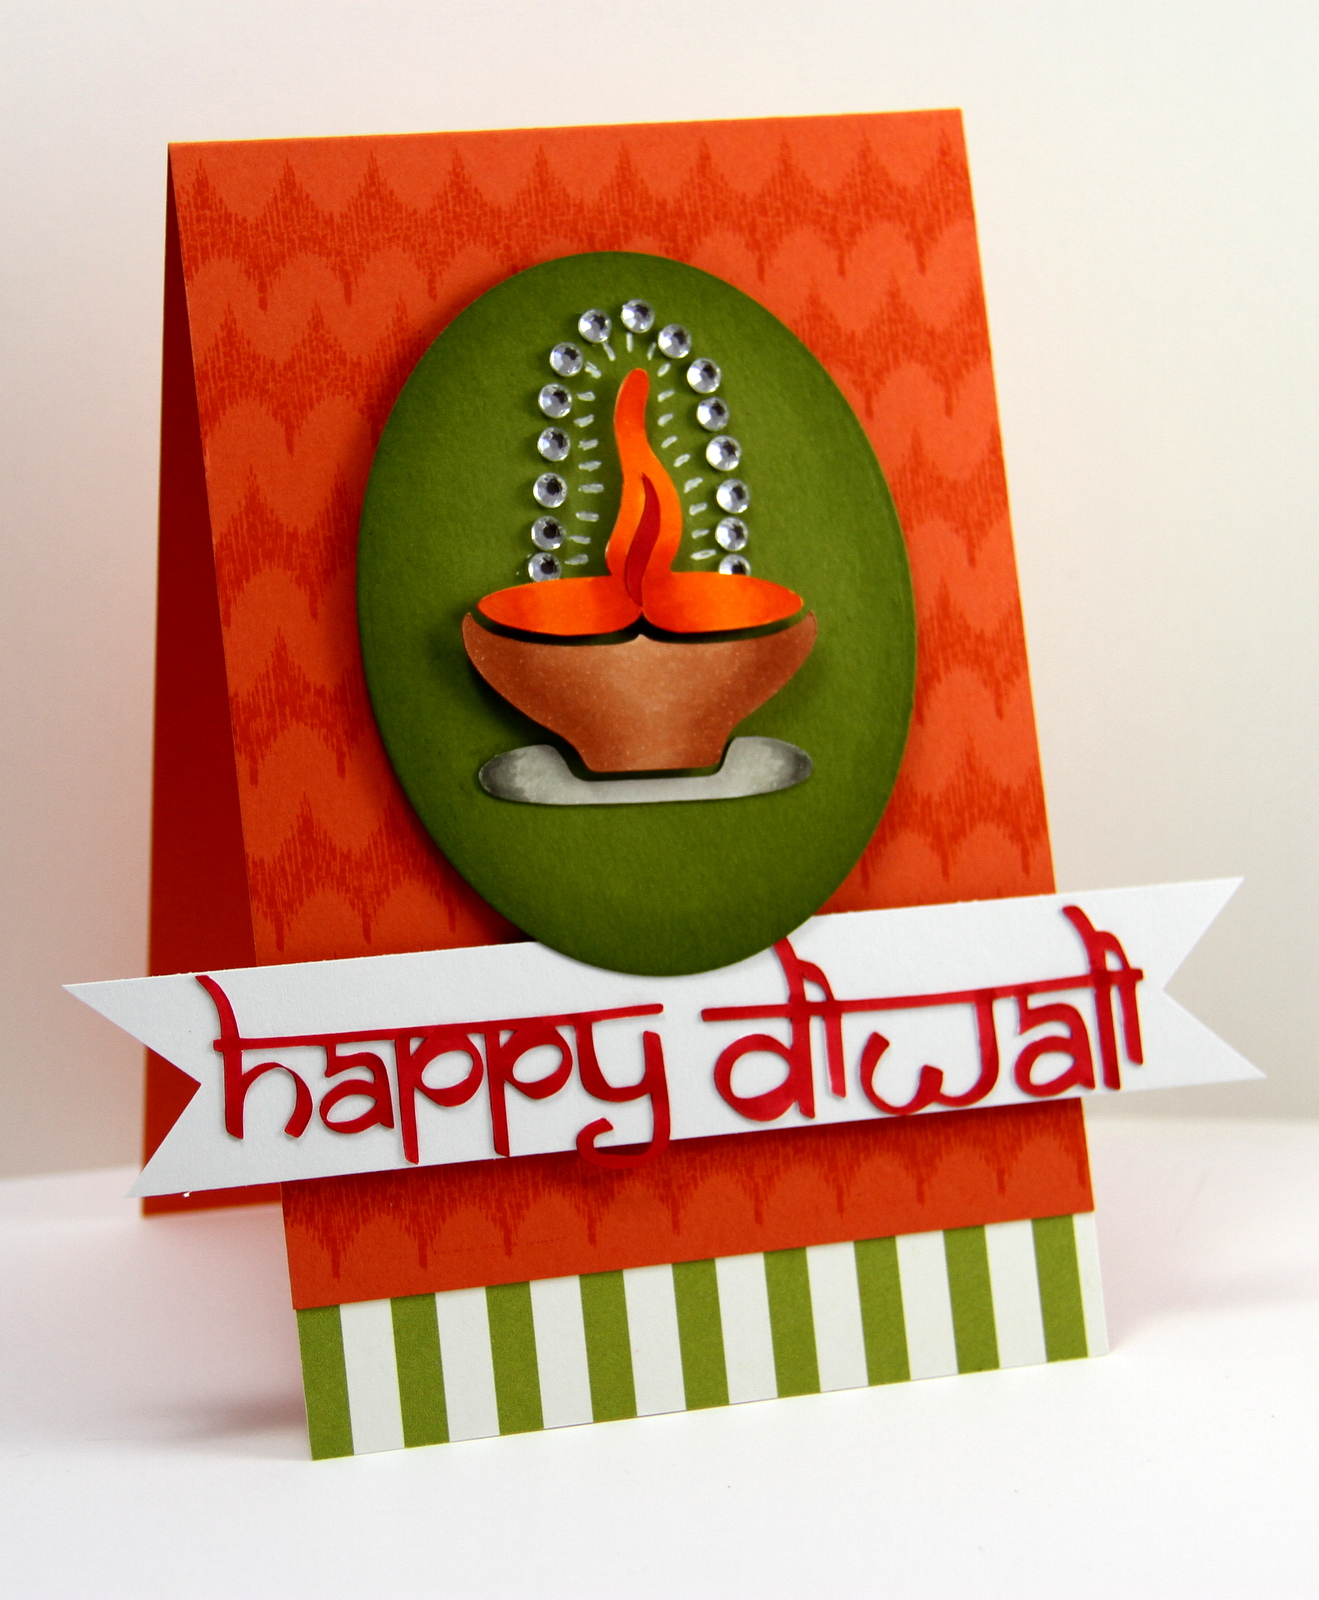 Handmade by g3 diwali blog hop diwali blog hop m4hsunfo